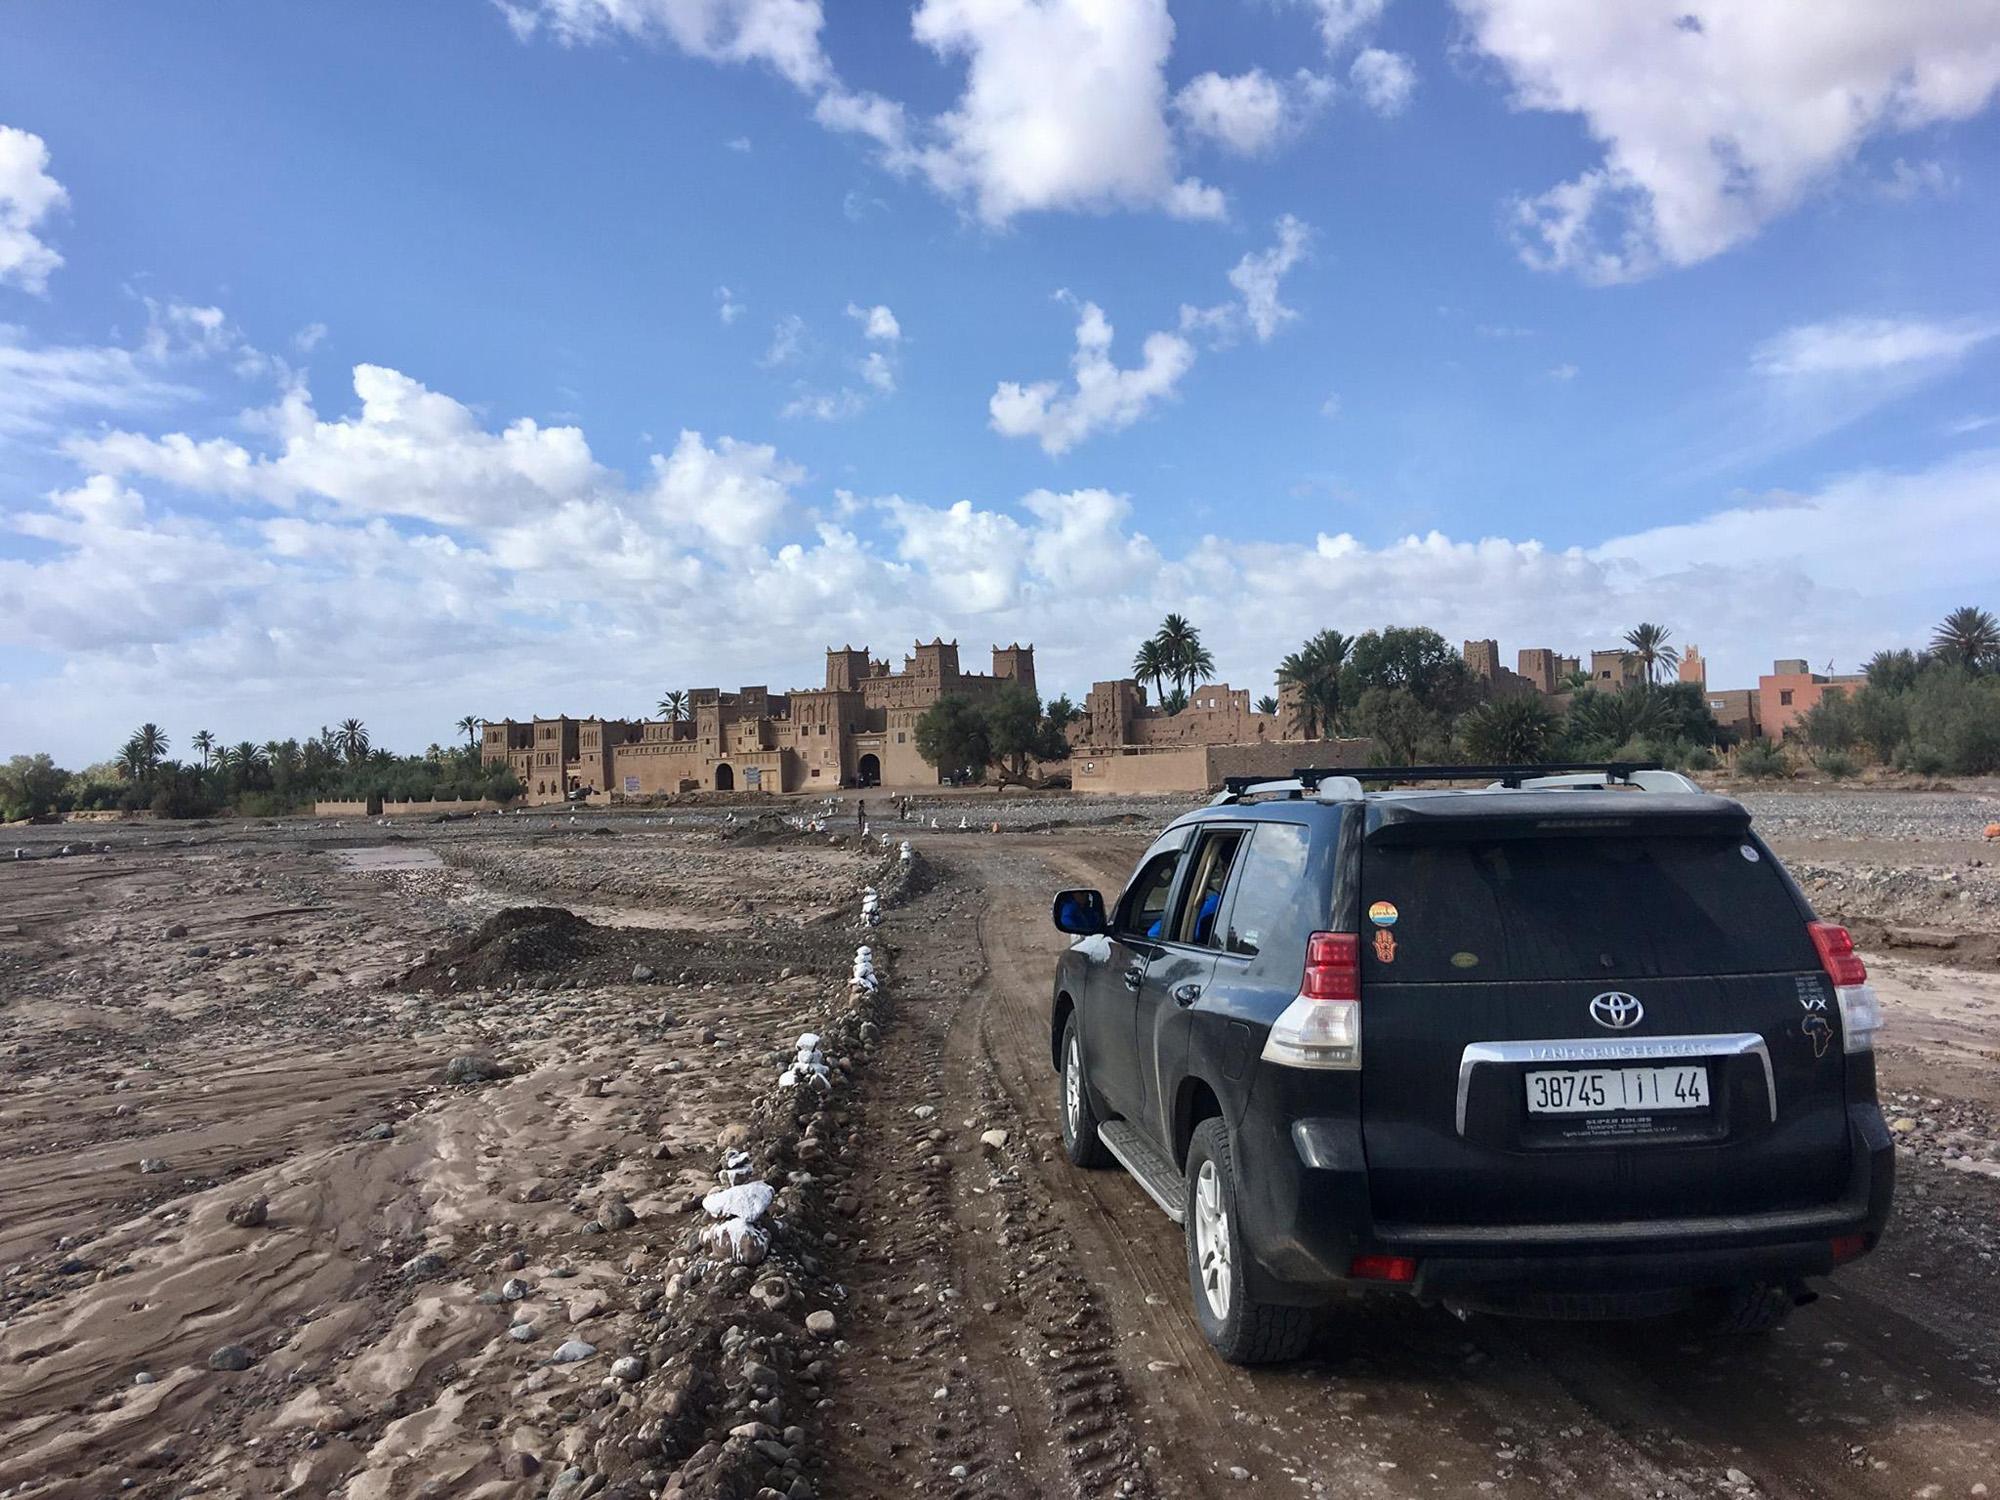 KASBAH AMRIDIL-Marruecos